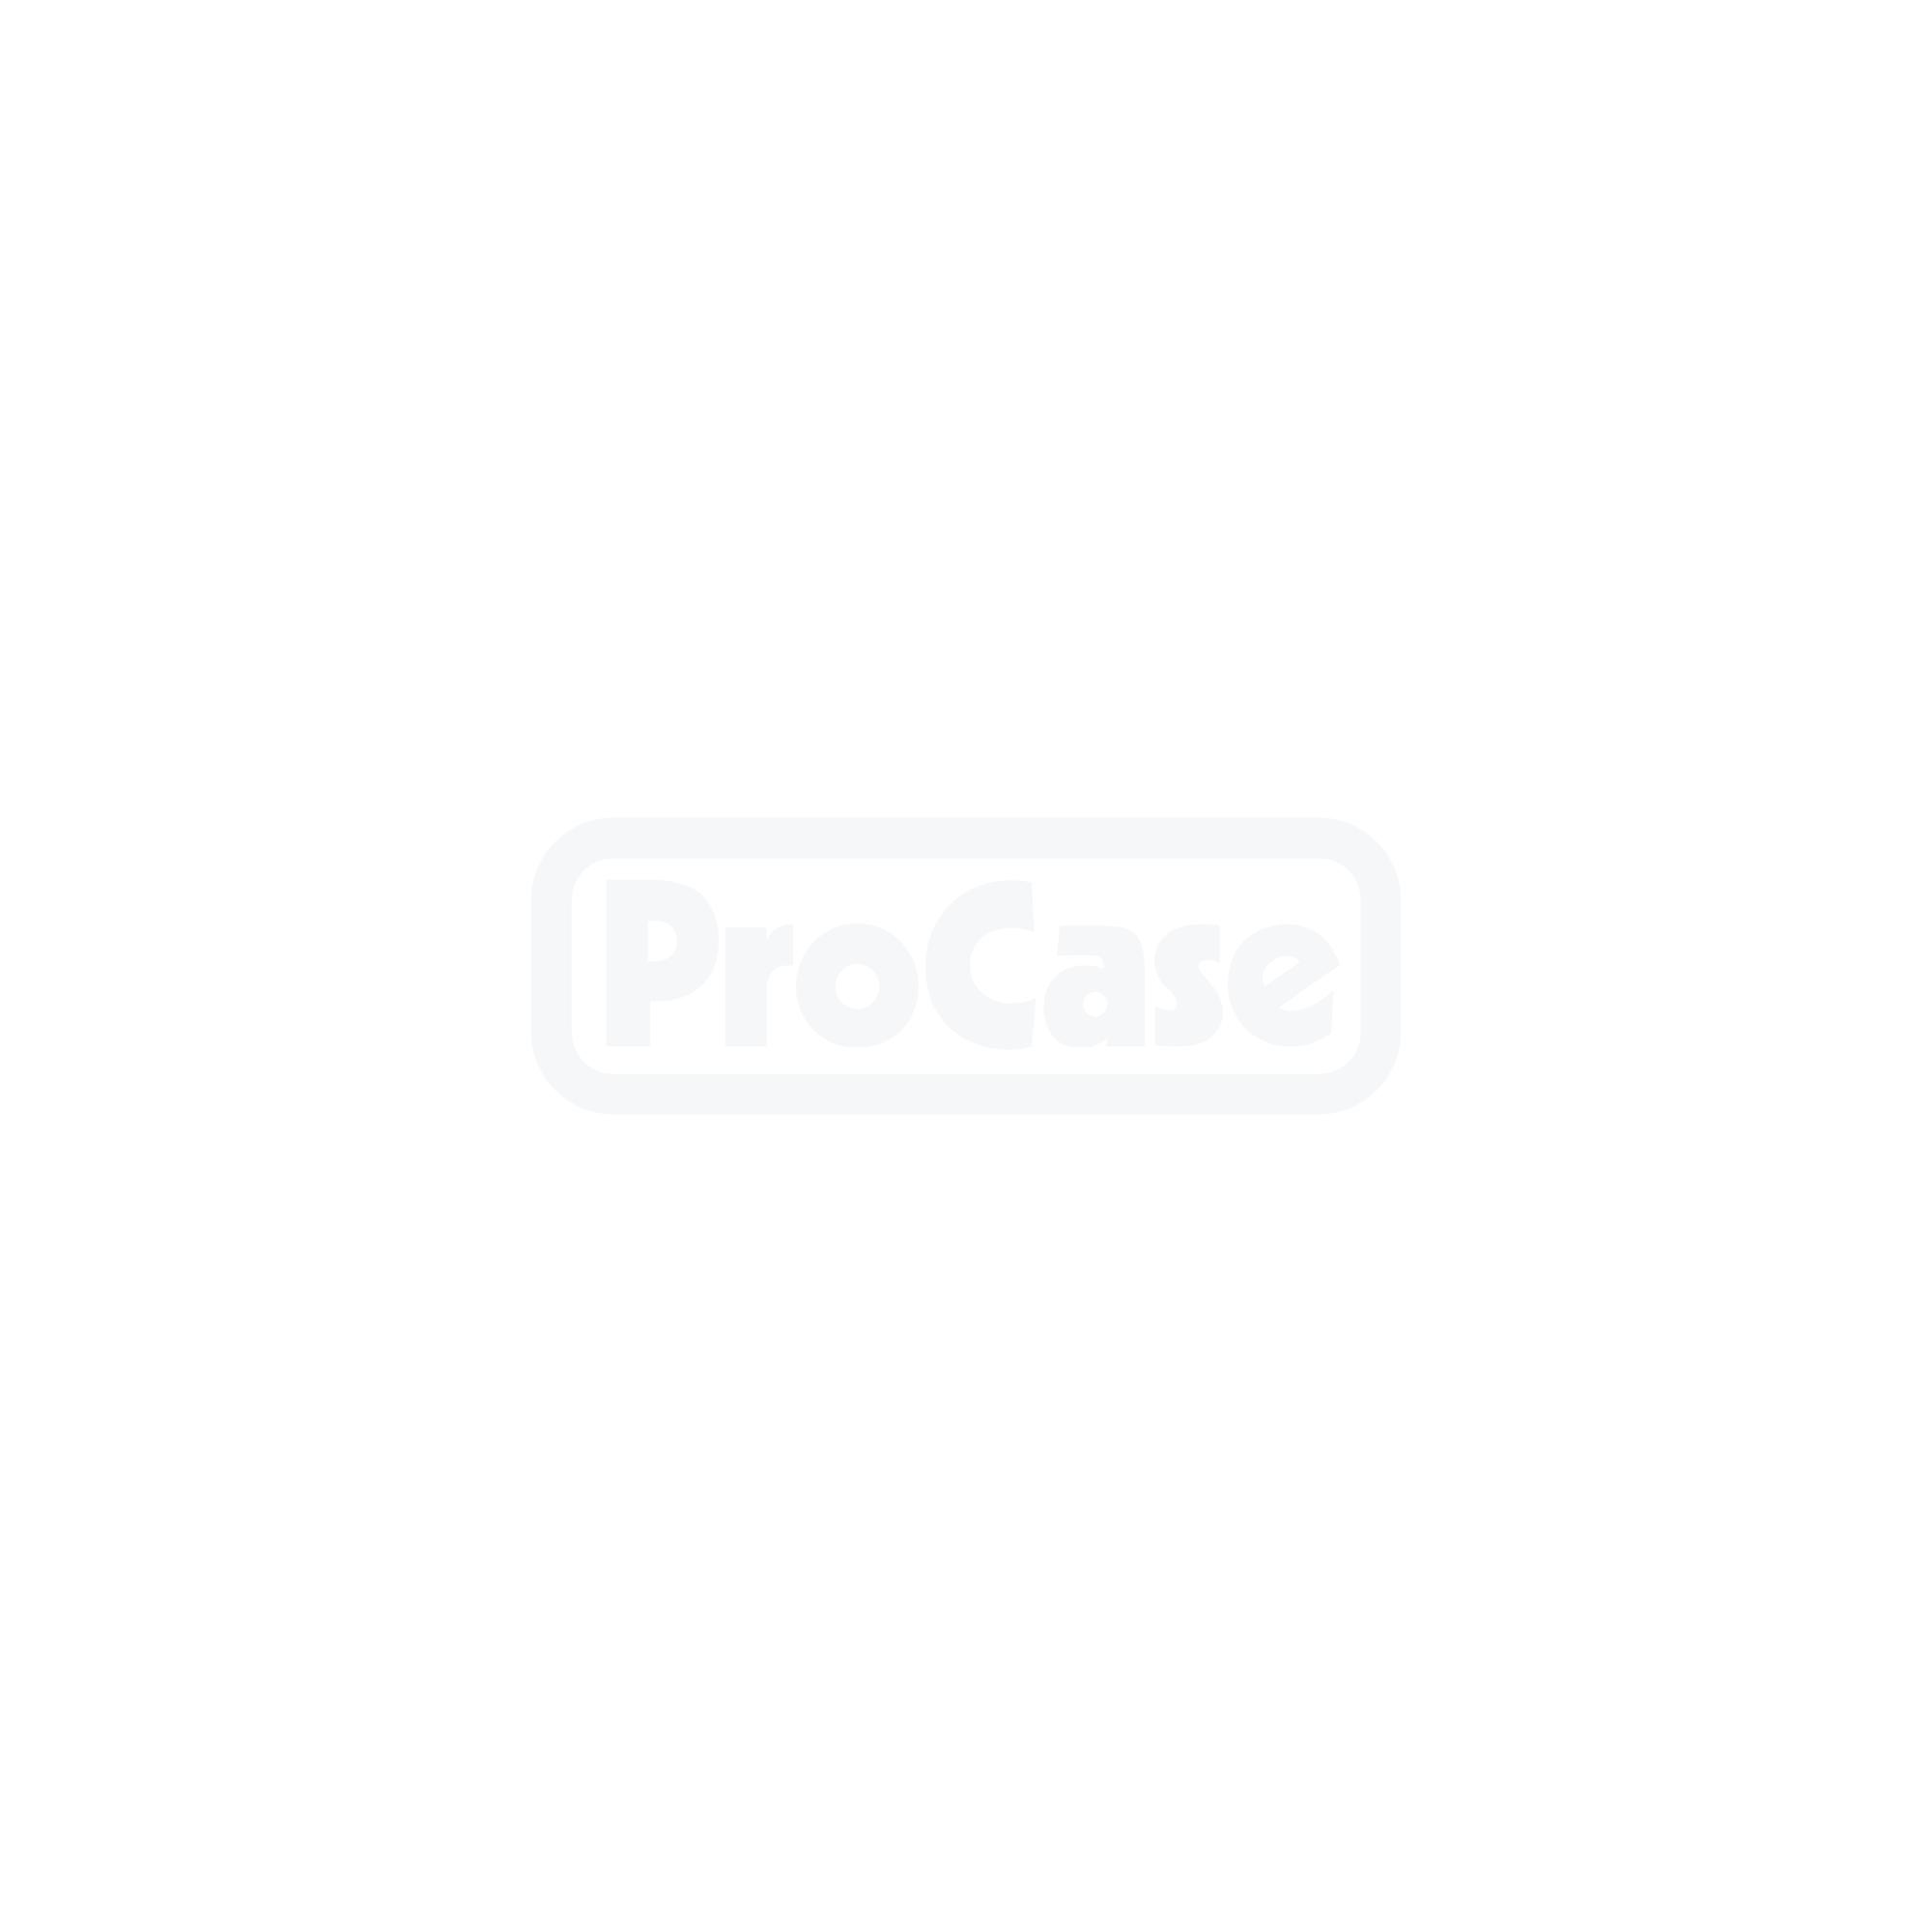 Flightcase Vari-Lite VL1000/1100 Etagencase